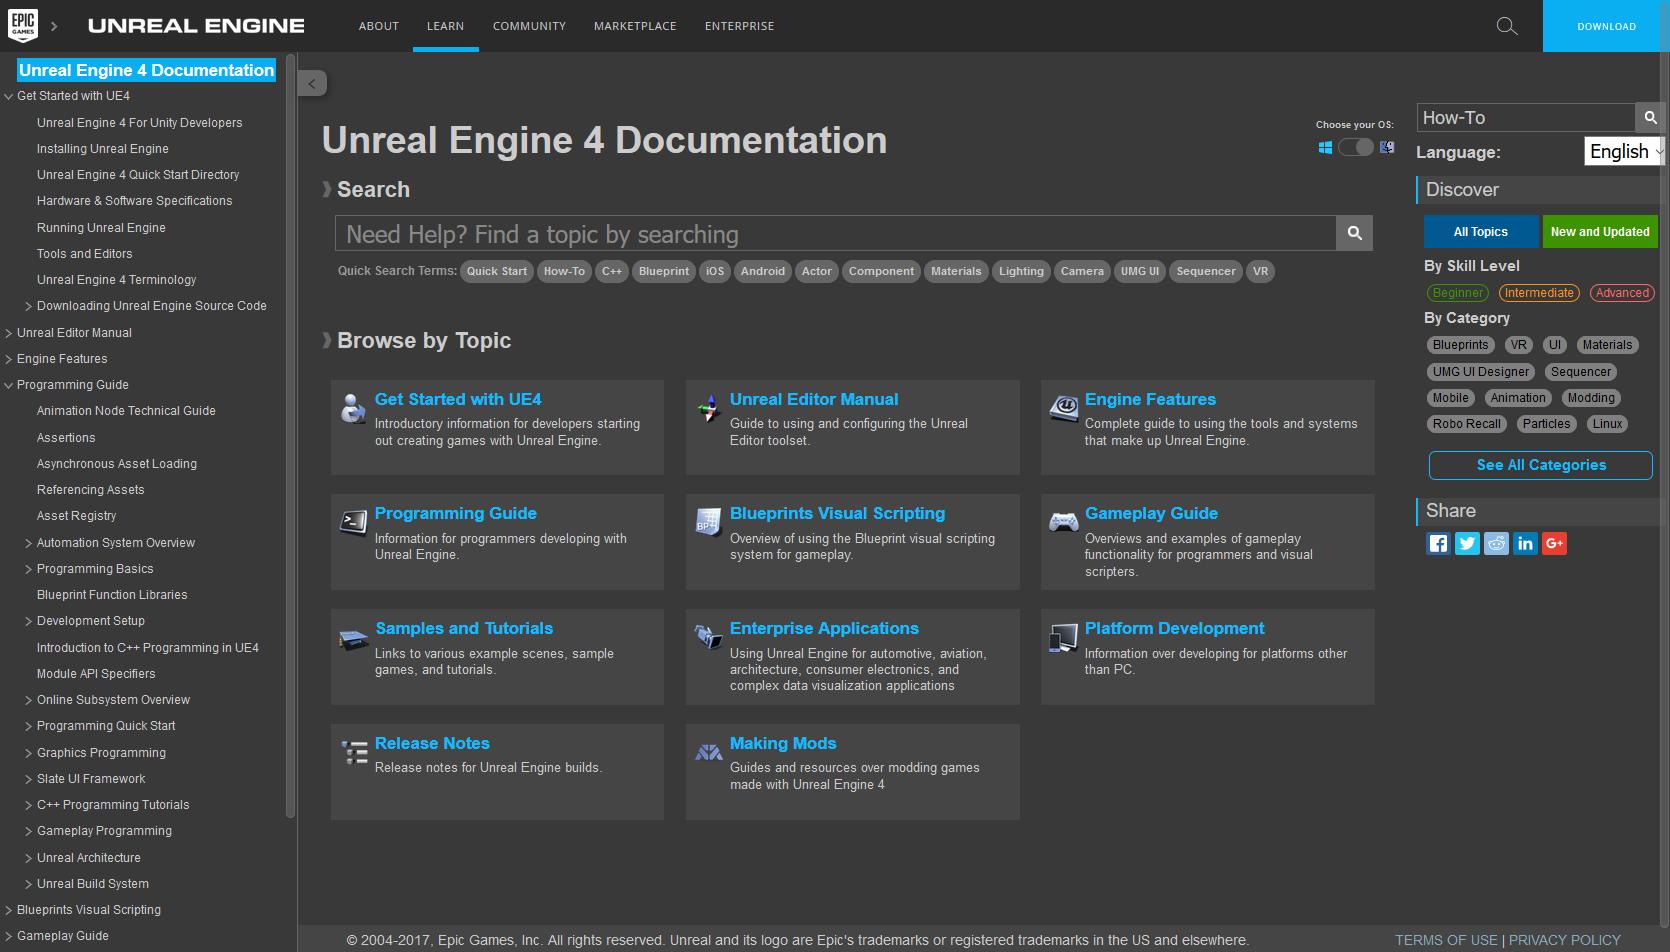 Unrealengine themes skins userstyles unrealengine documentation dark theme malvernweather Image collections